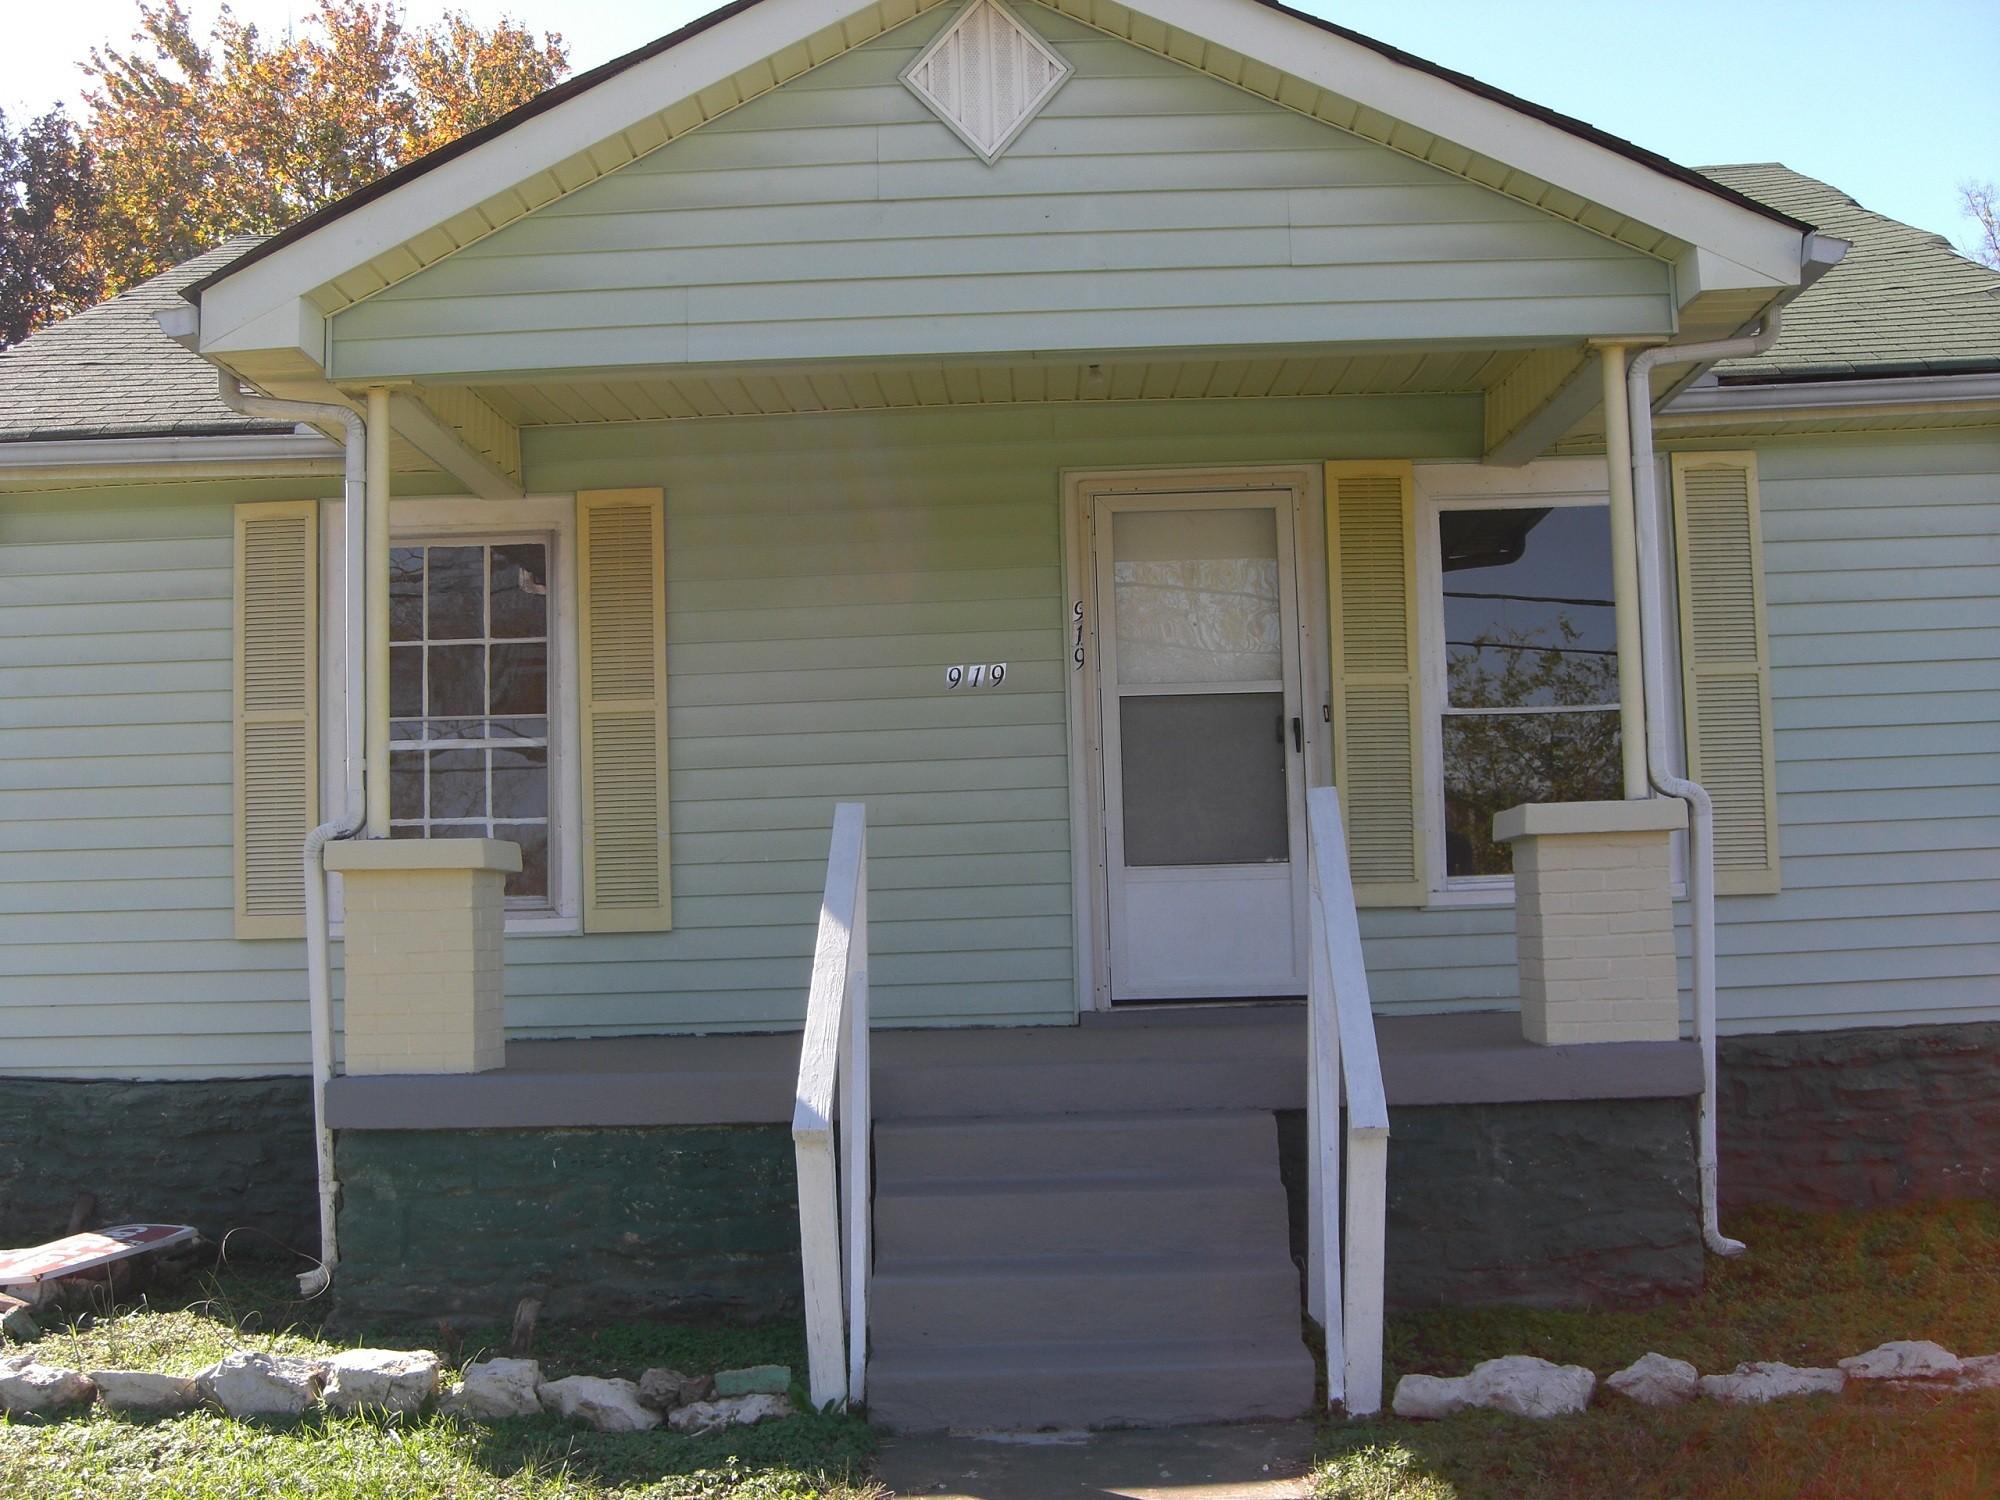 919 31st ave n nashville tn 37209 2 bedroom apartment for rent for 750 month zumper for 2 bedroom apartments in nashville tn